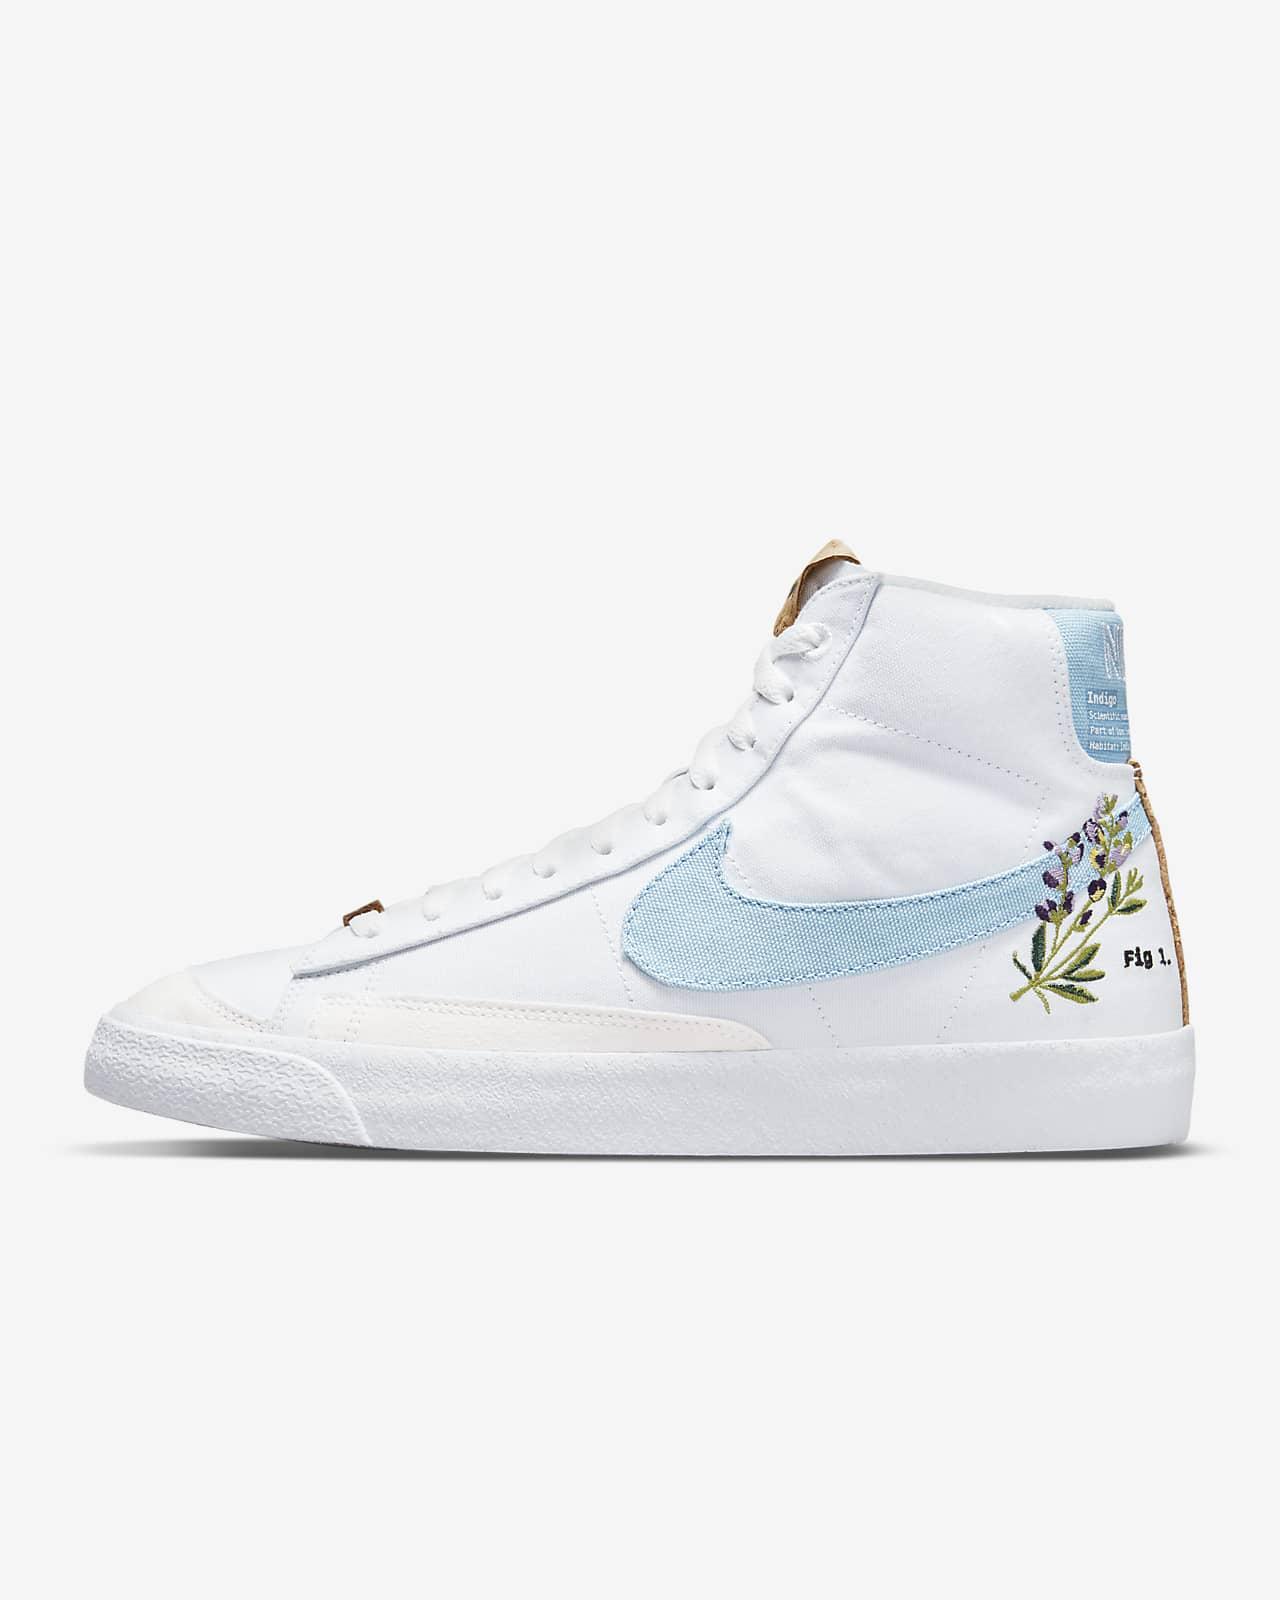 Nike Blazer Mid '77 Men's Shoes. Nike LU